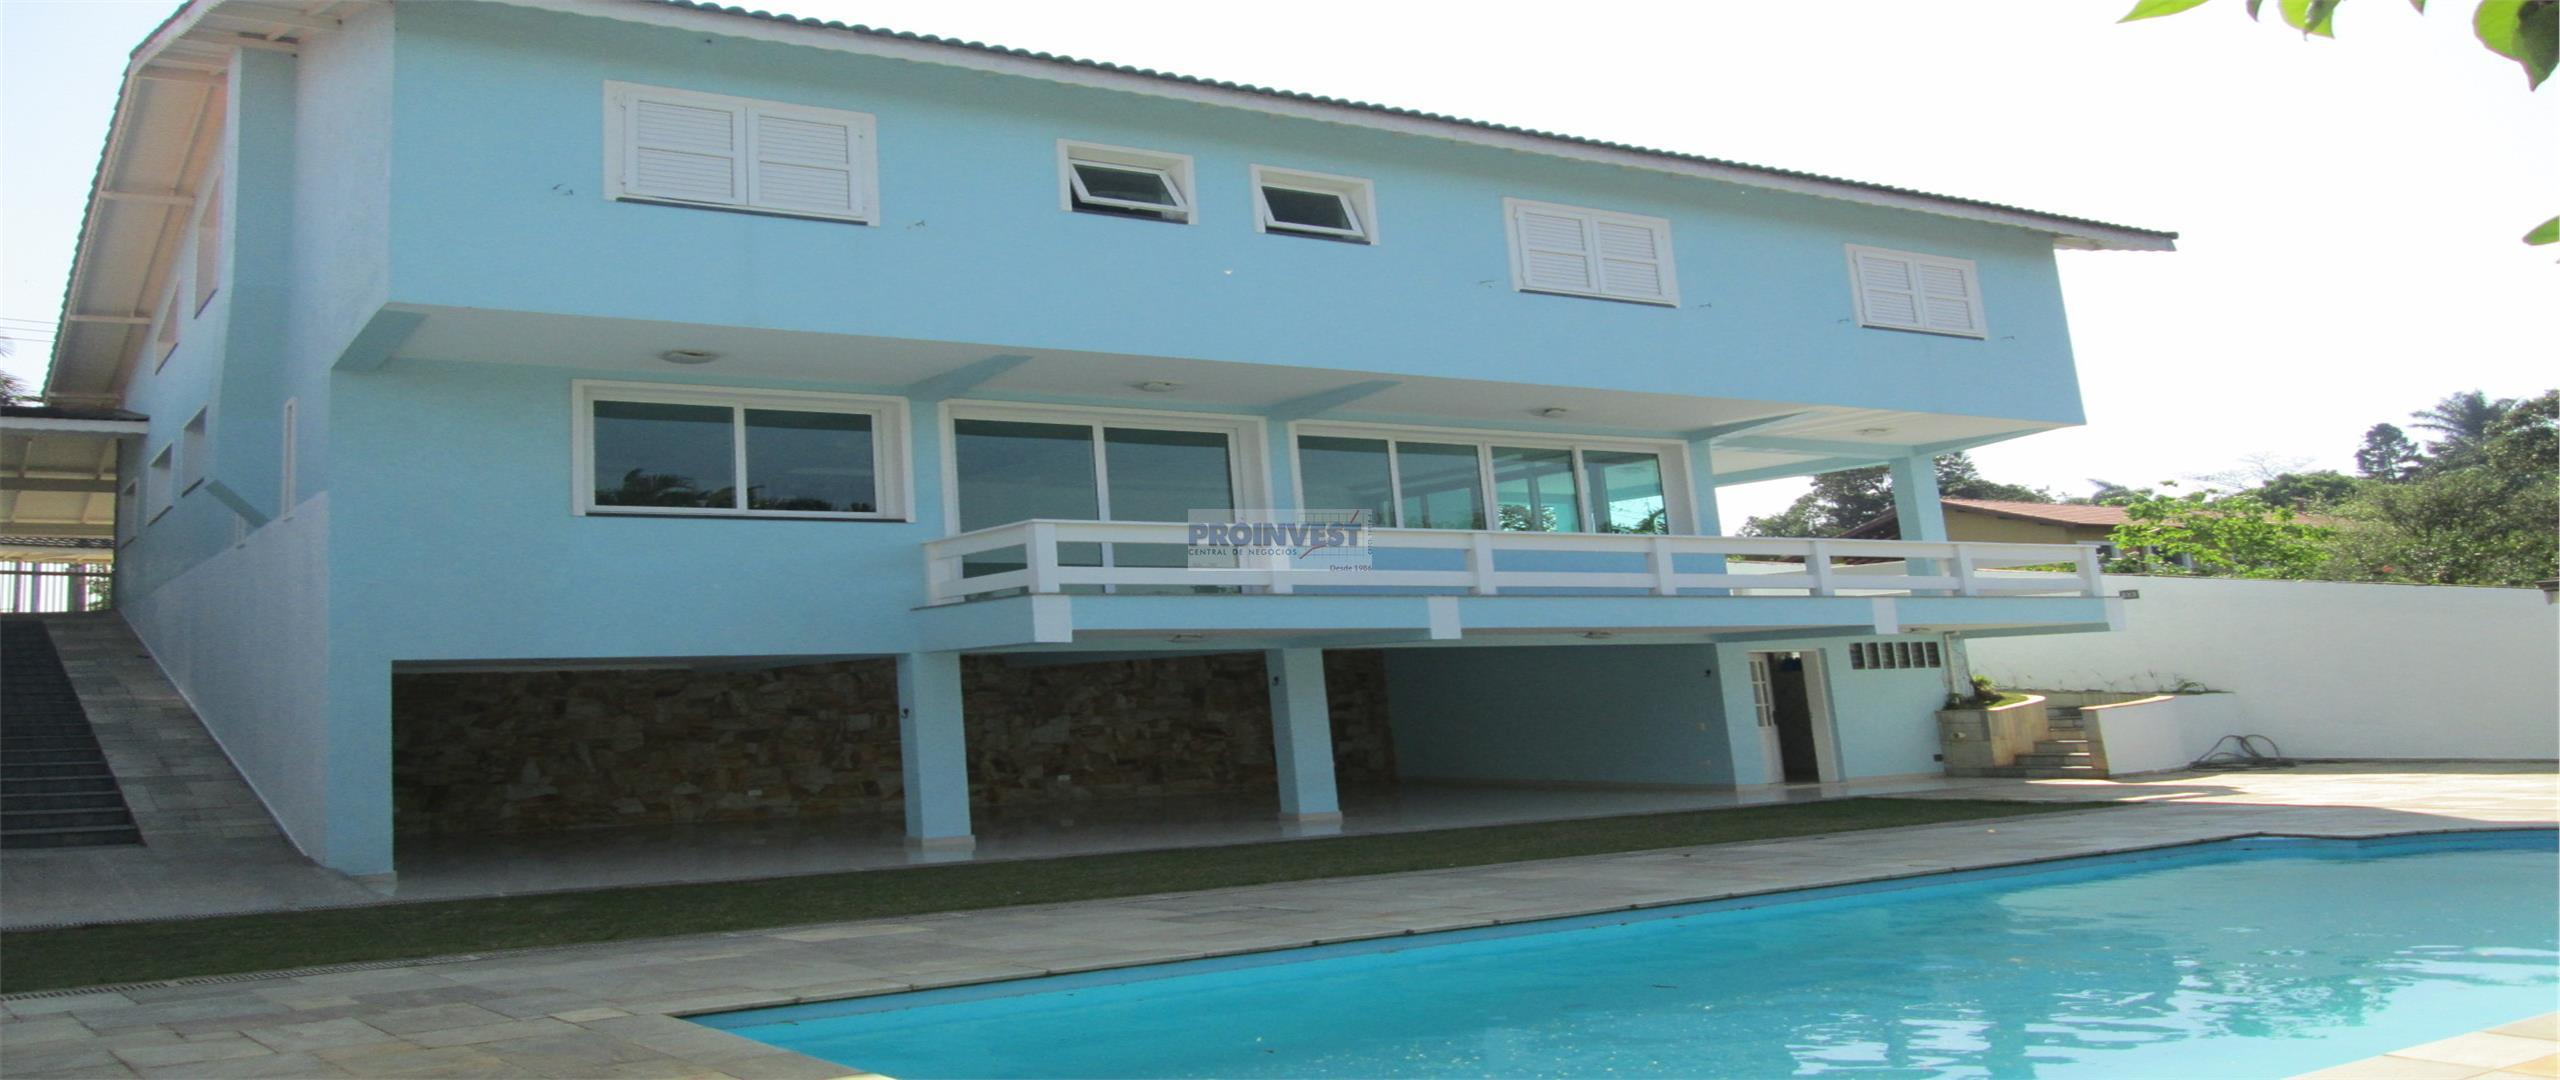 Selecione residencial à venda, Vila Santo Antônio, Cotia.